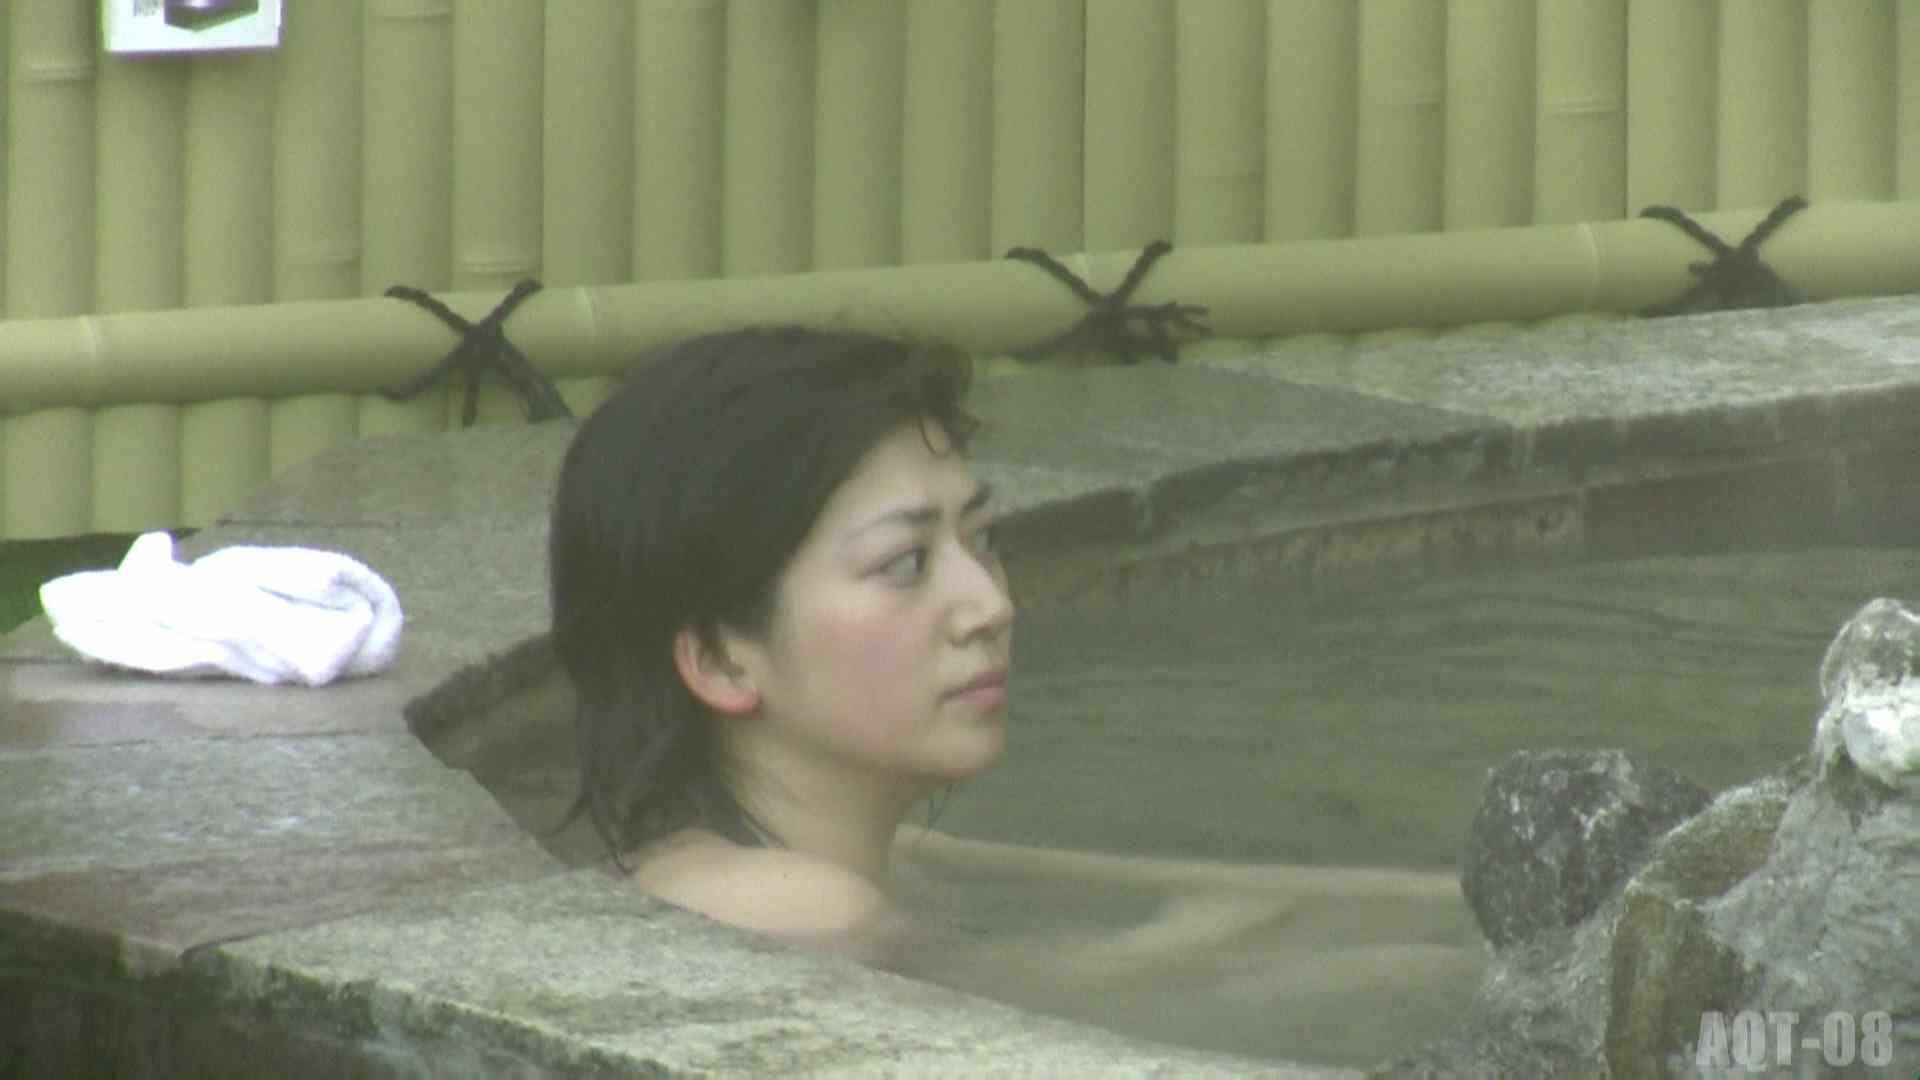 Aquaな露天風呂Vol.776 盗撮 | HなOL  60pic 52